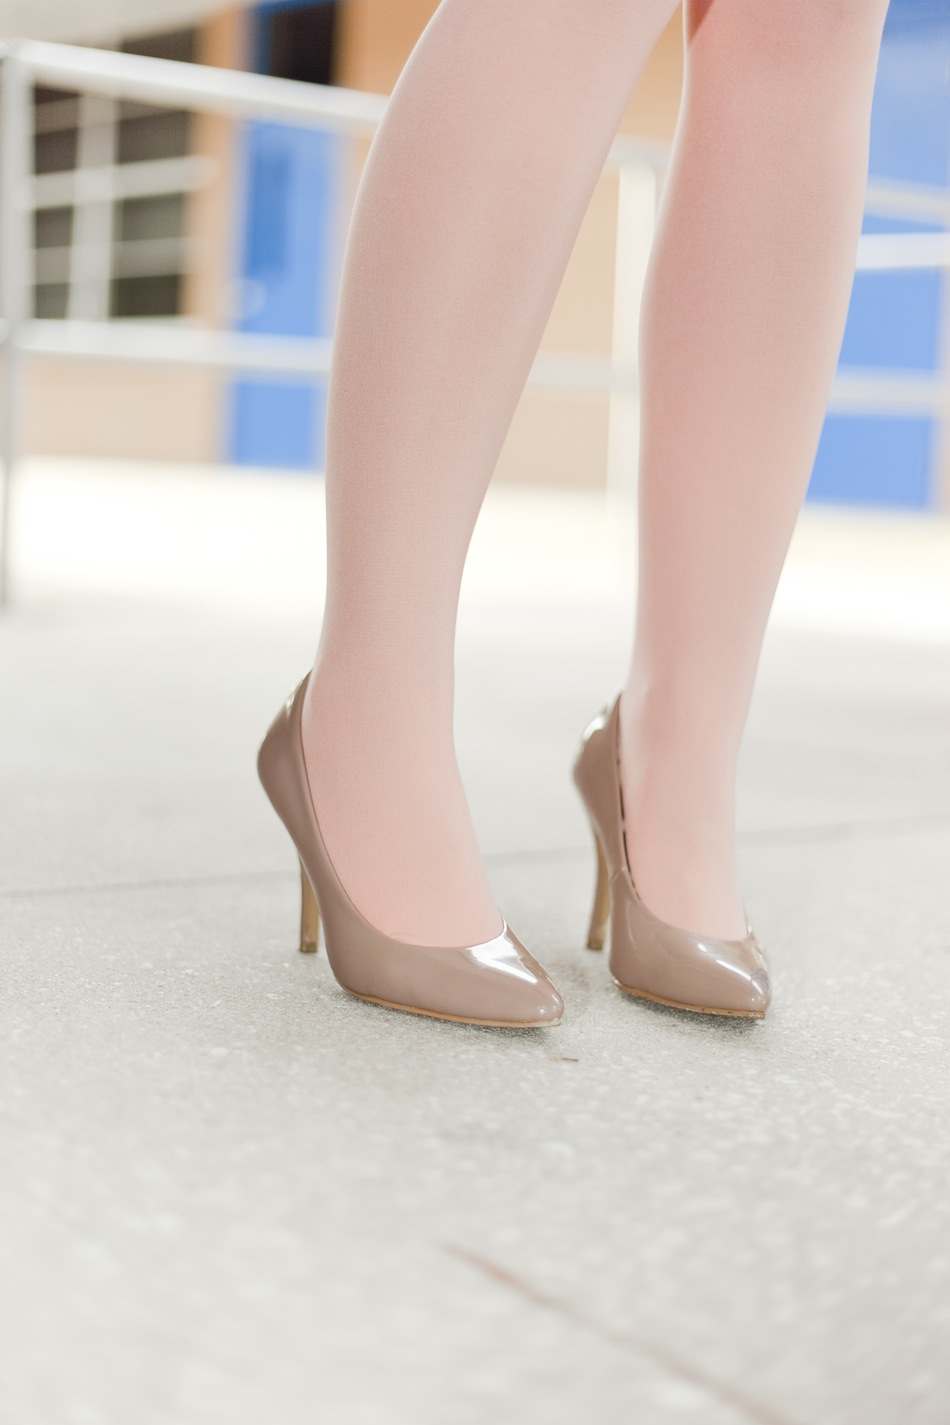 Feet Romper